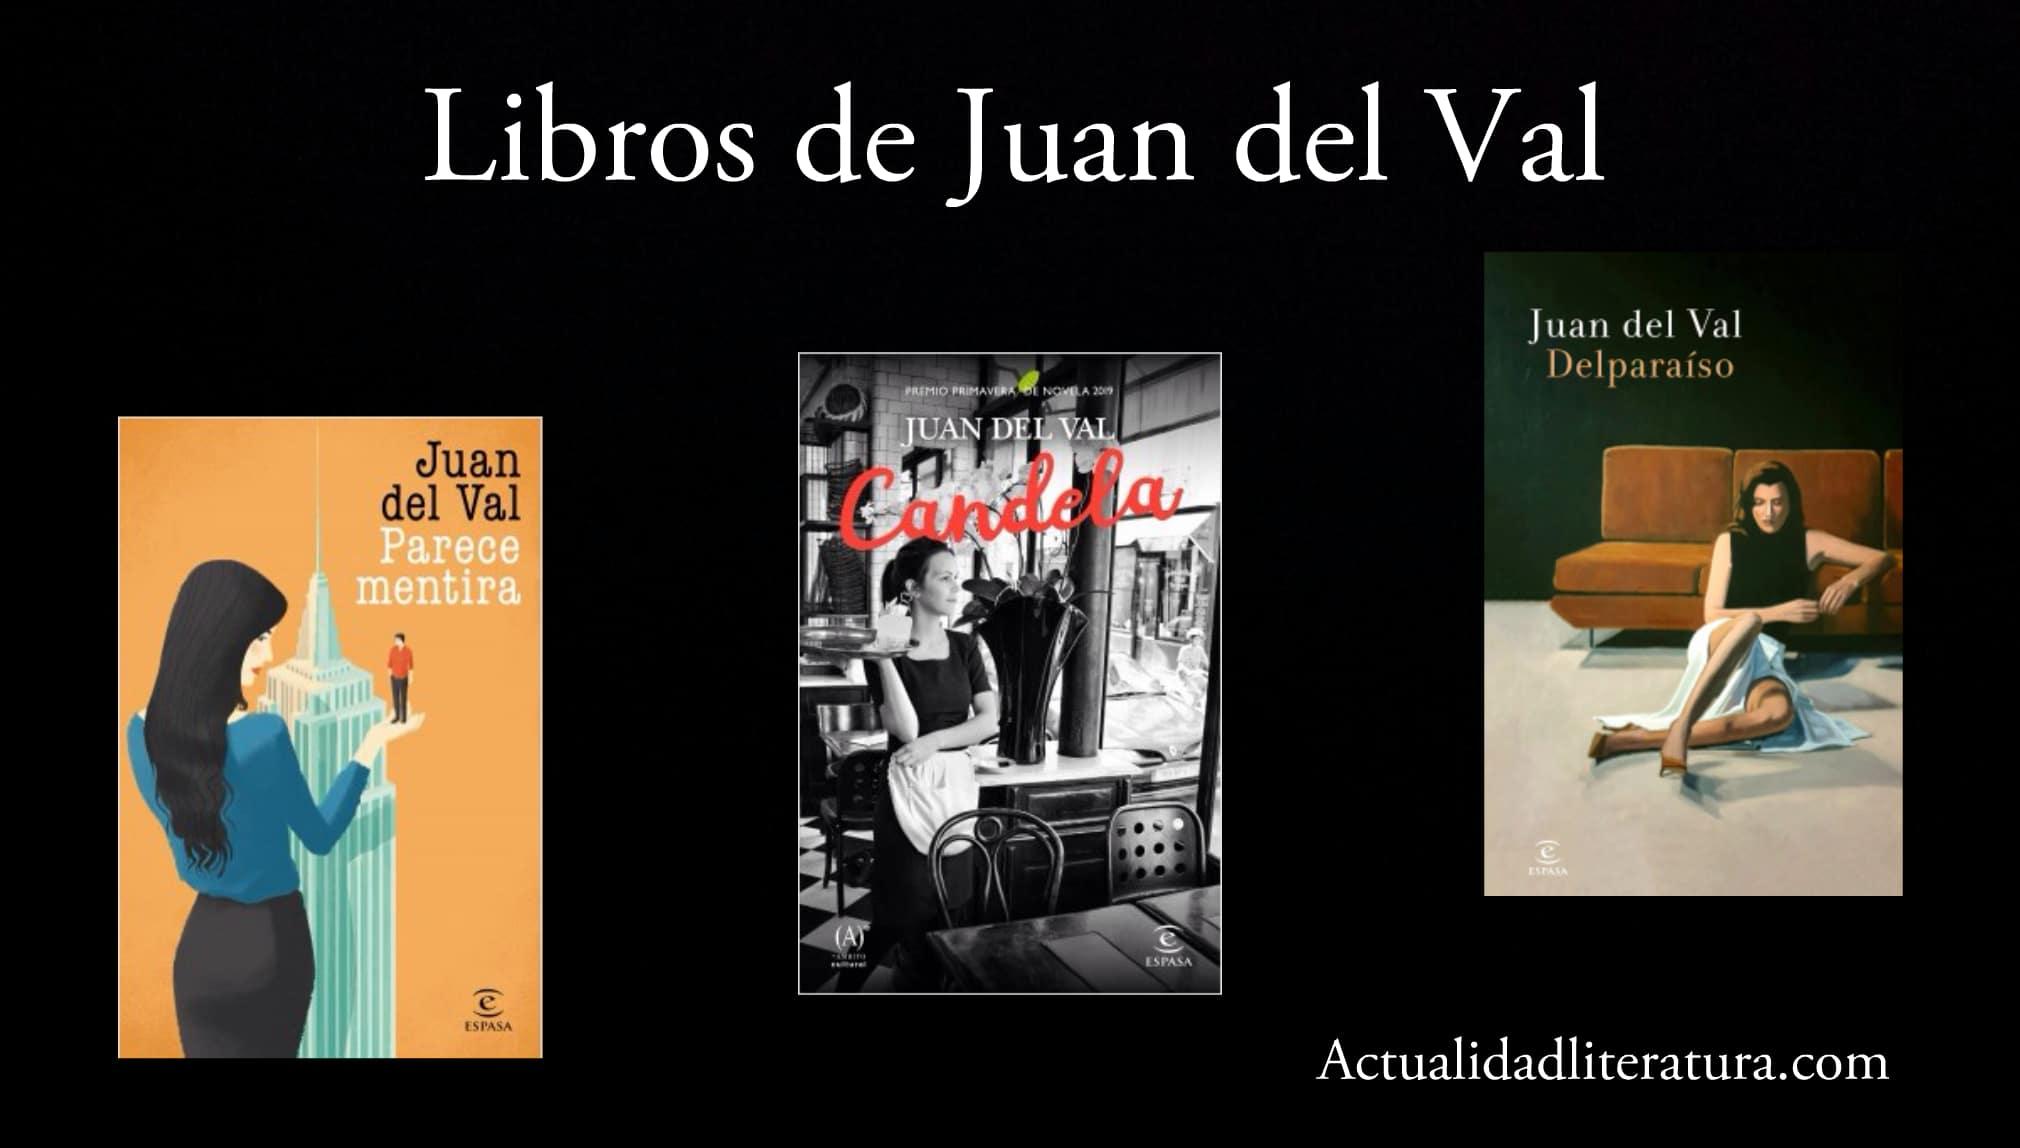 Libros de Juan del Val